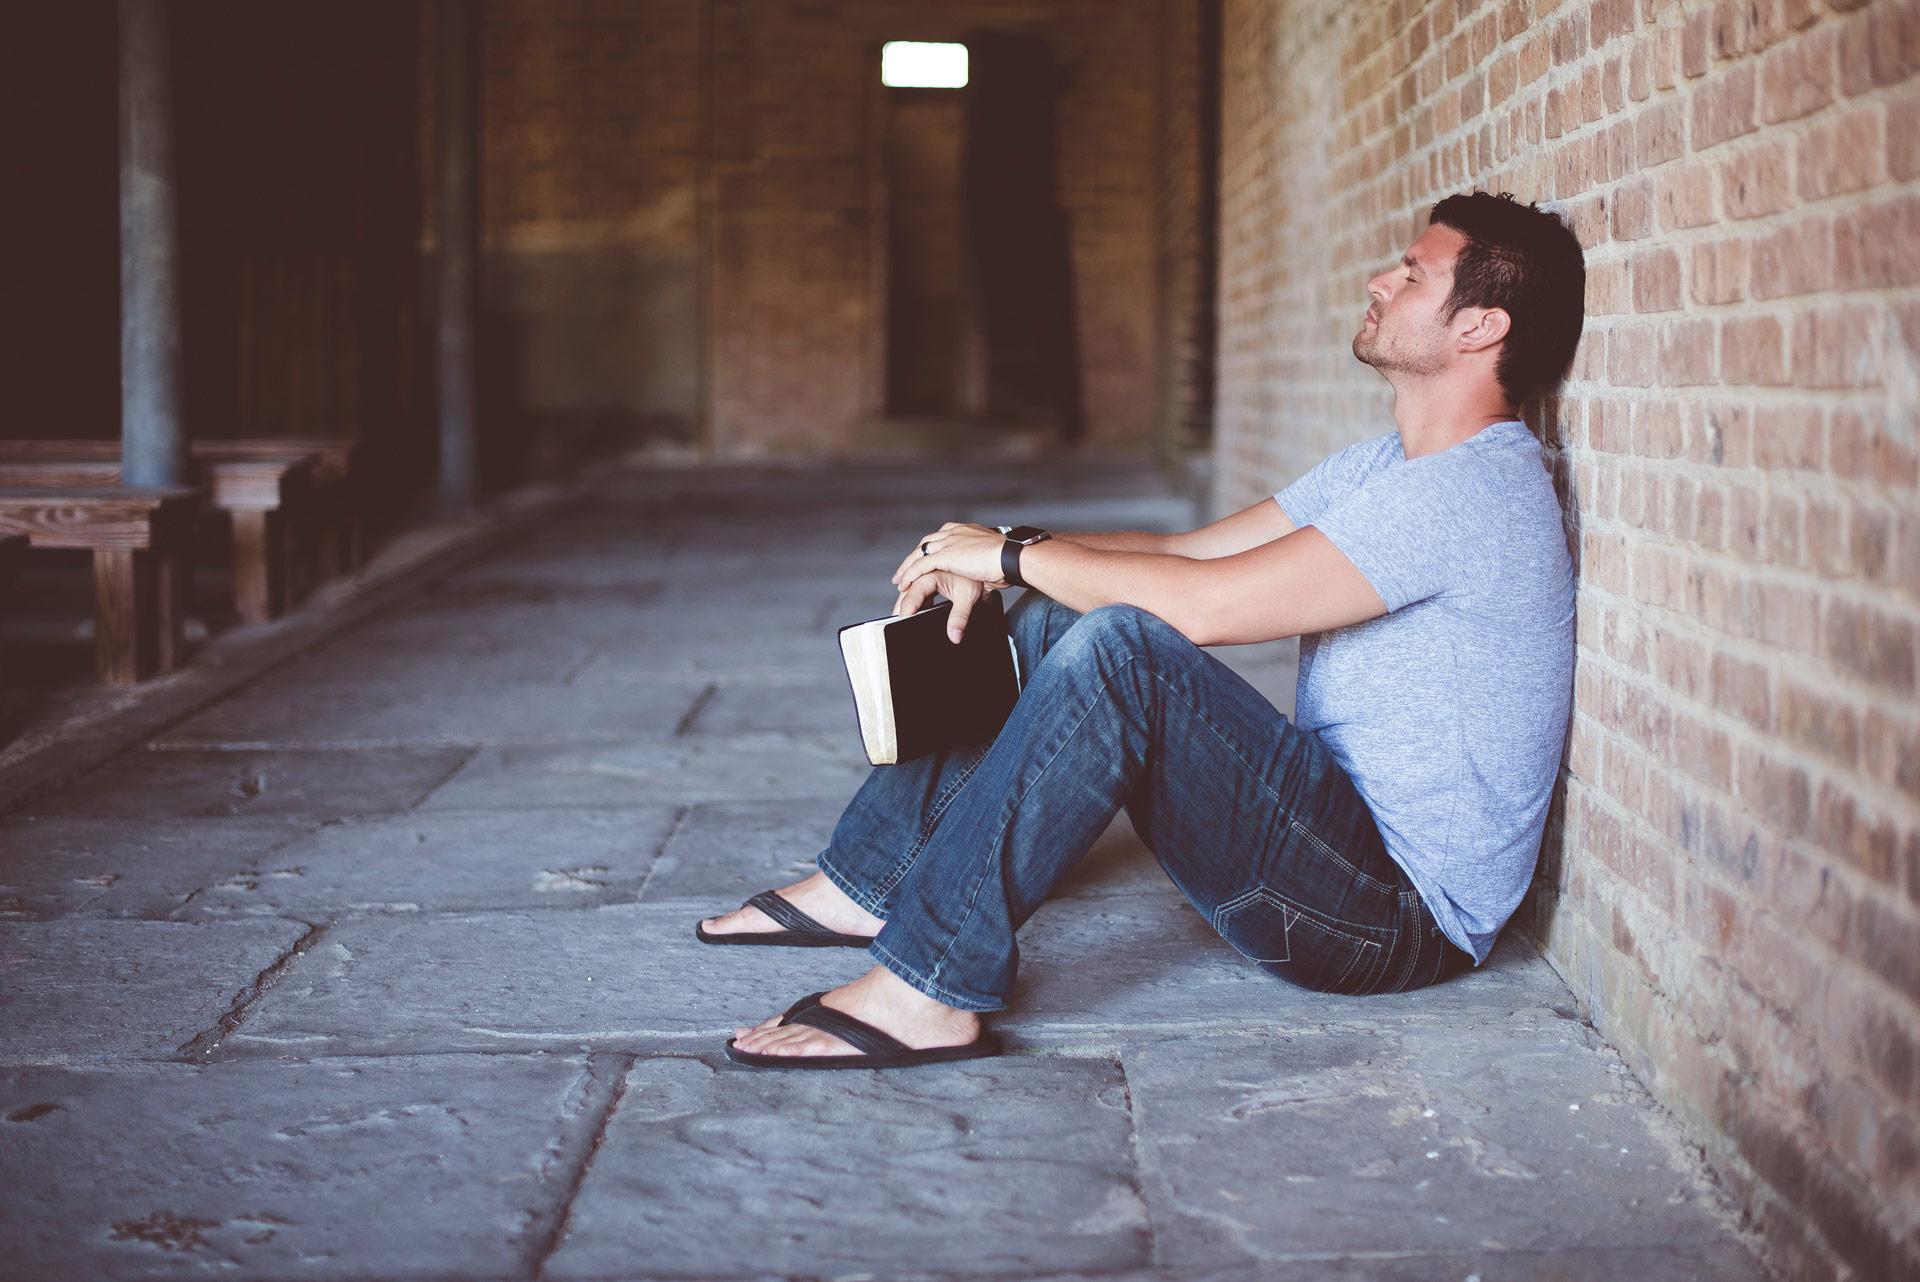 Як стати християнином